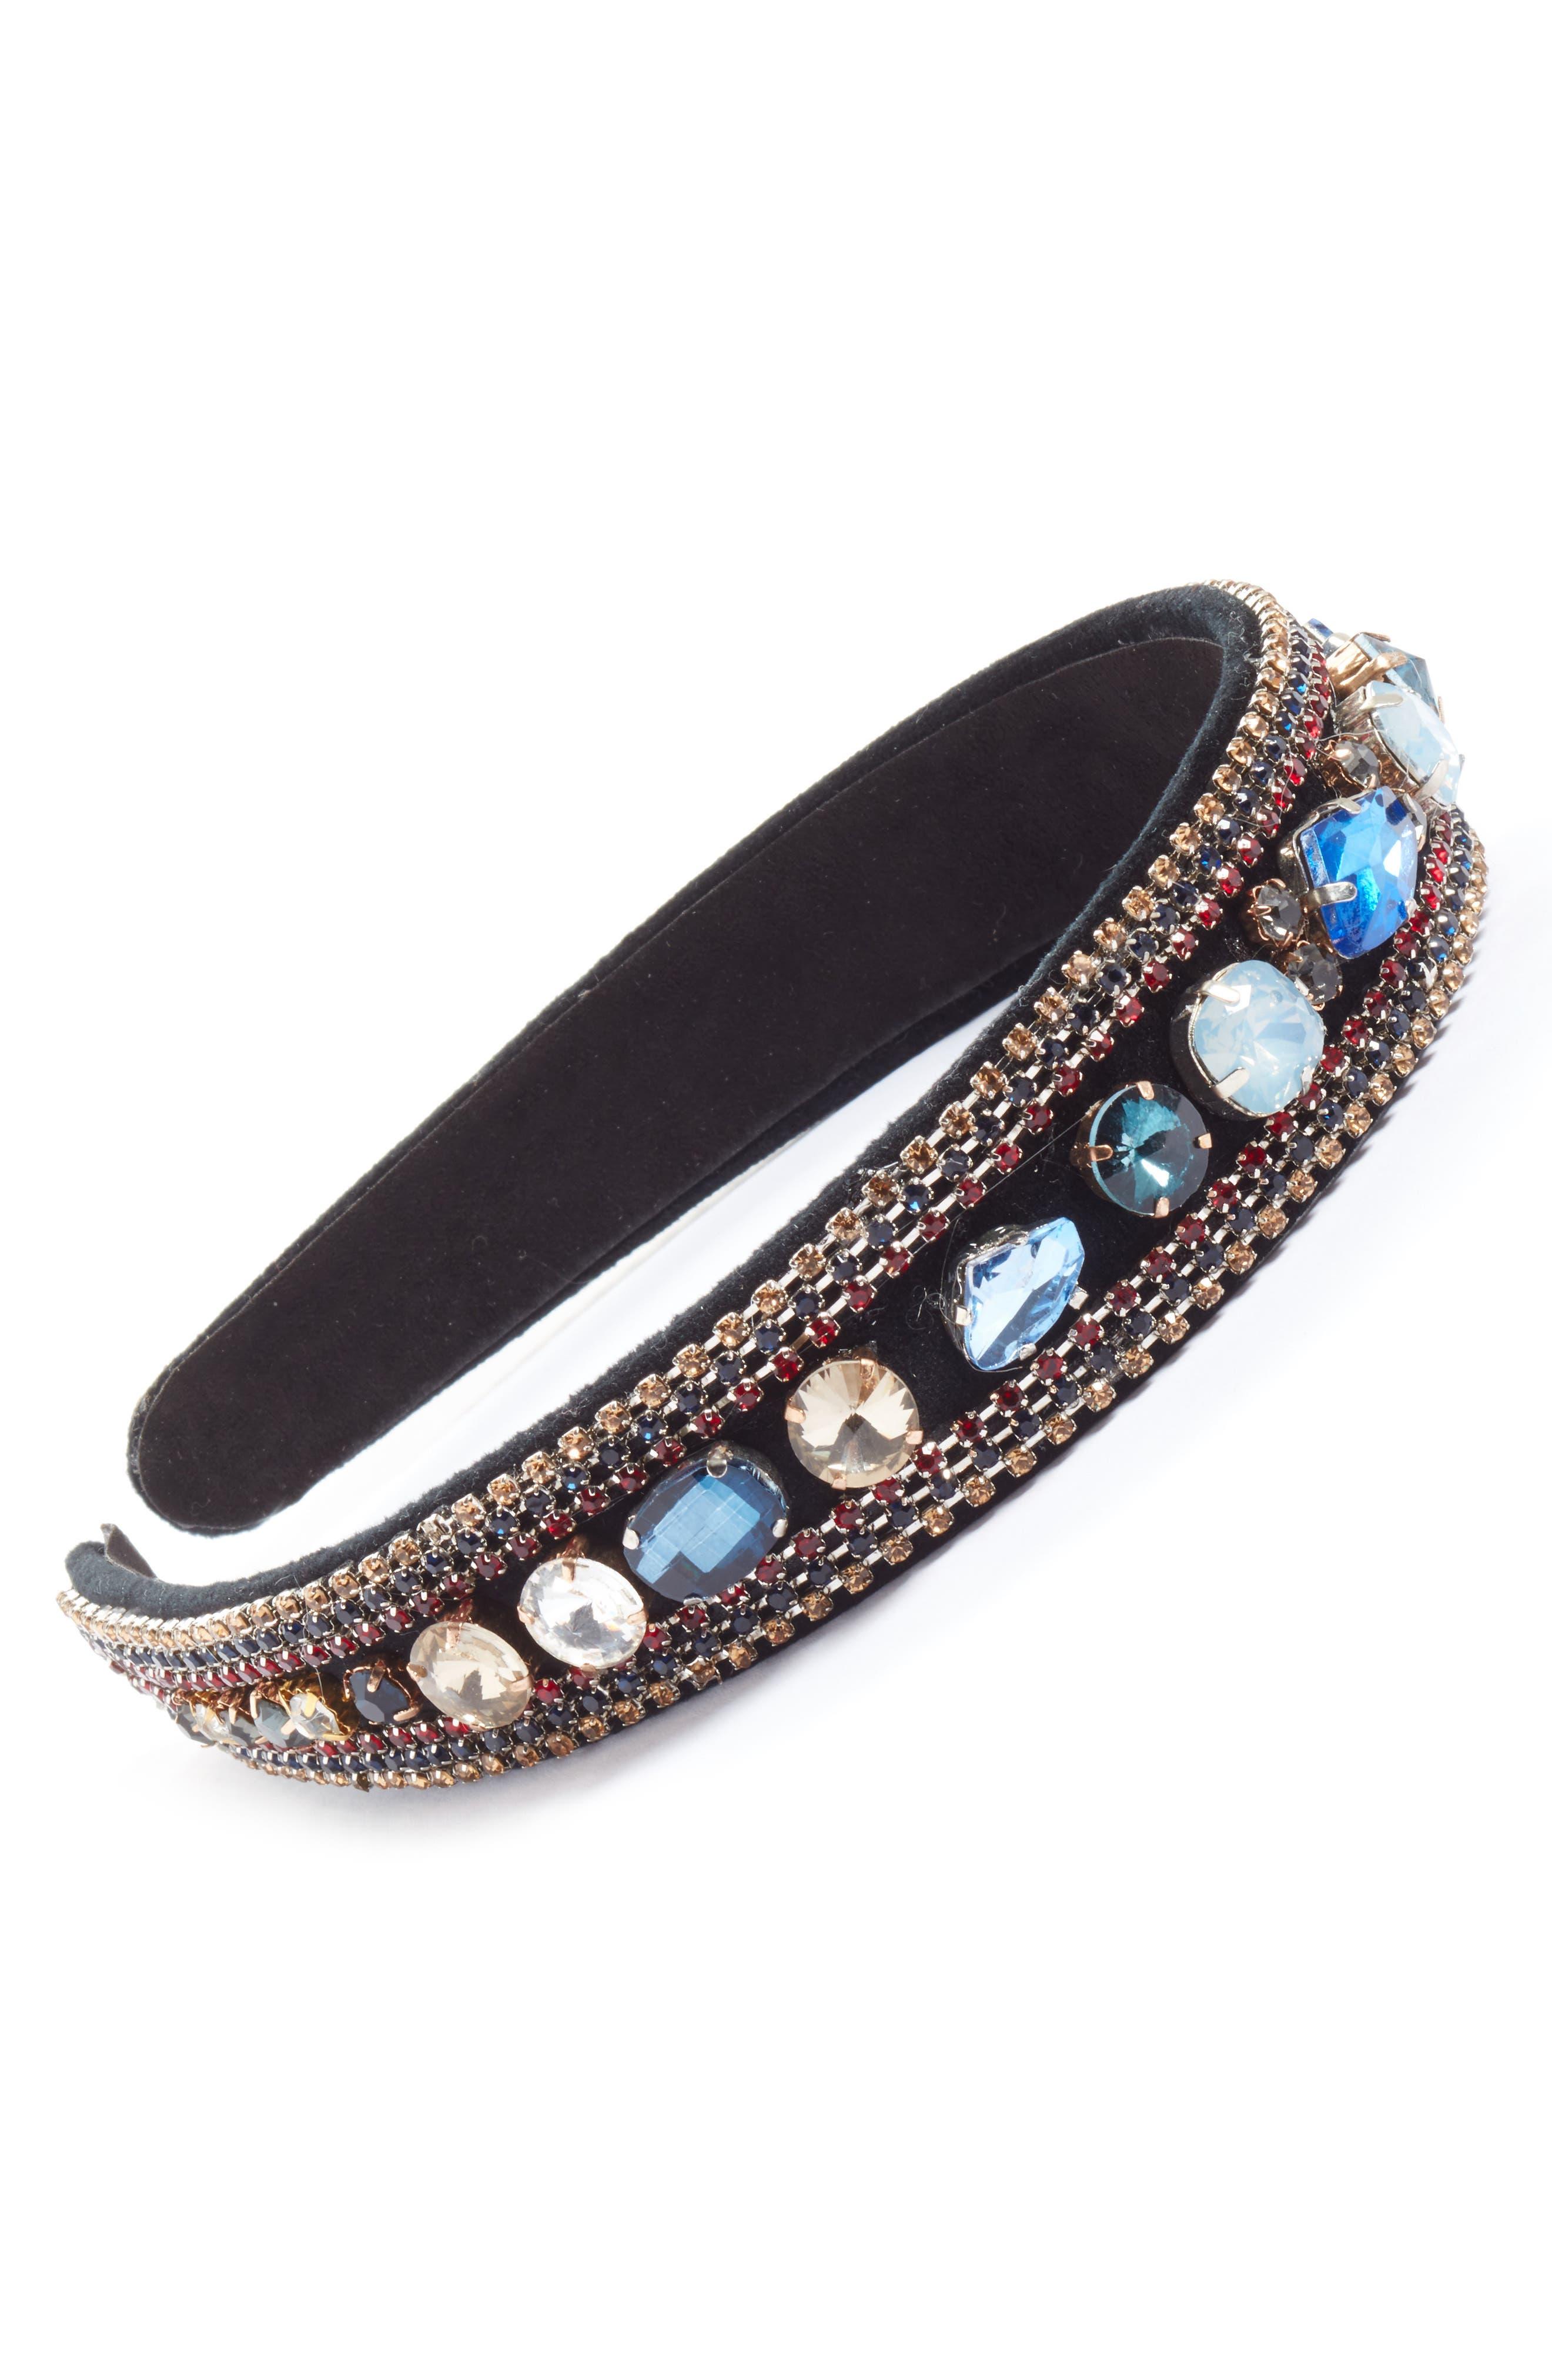 Alternate Image 1 Selected - Tasha Chunky Crystal Embellished Headband